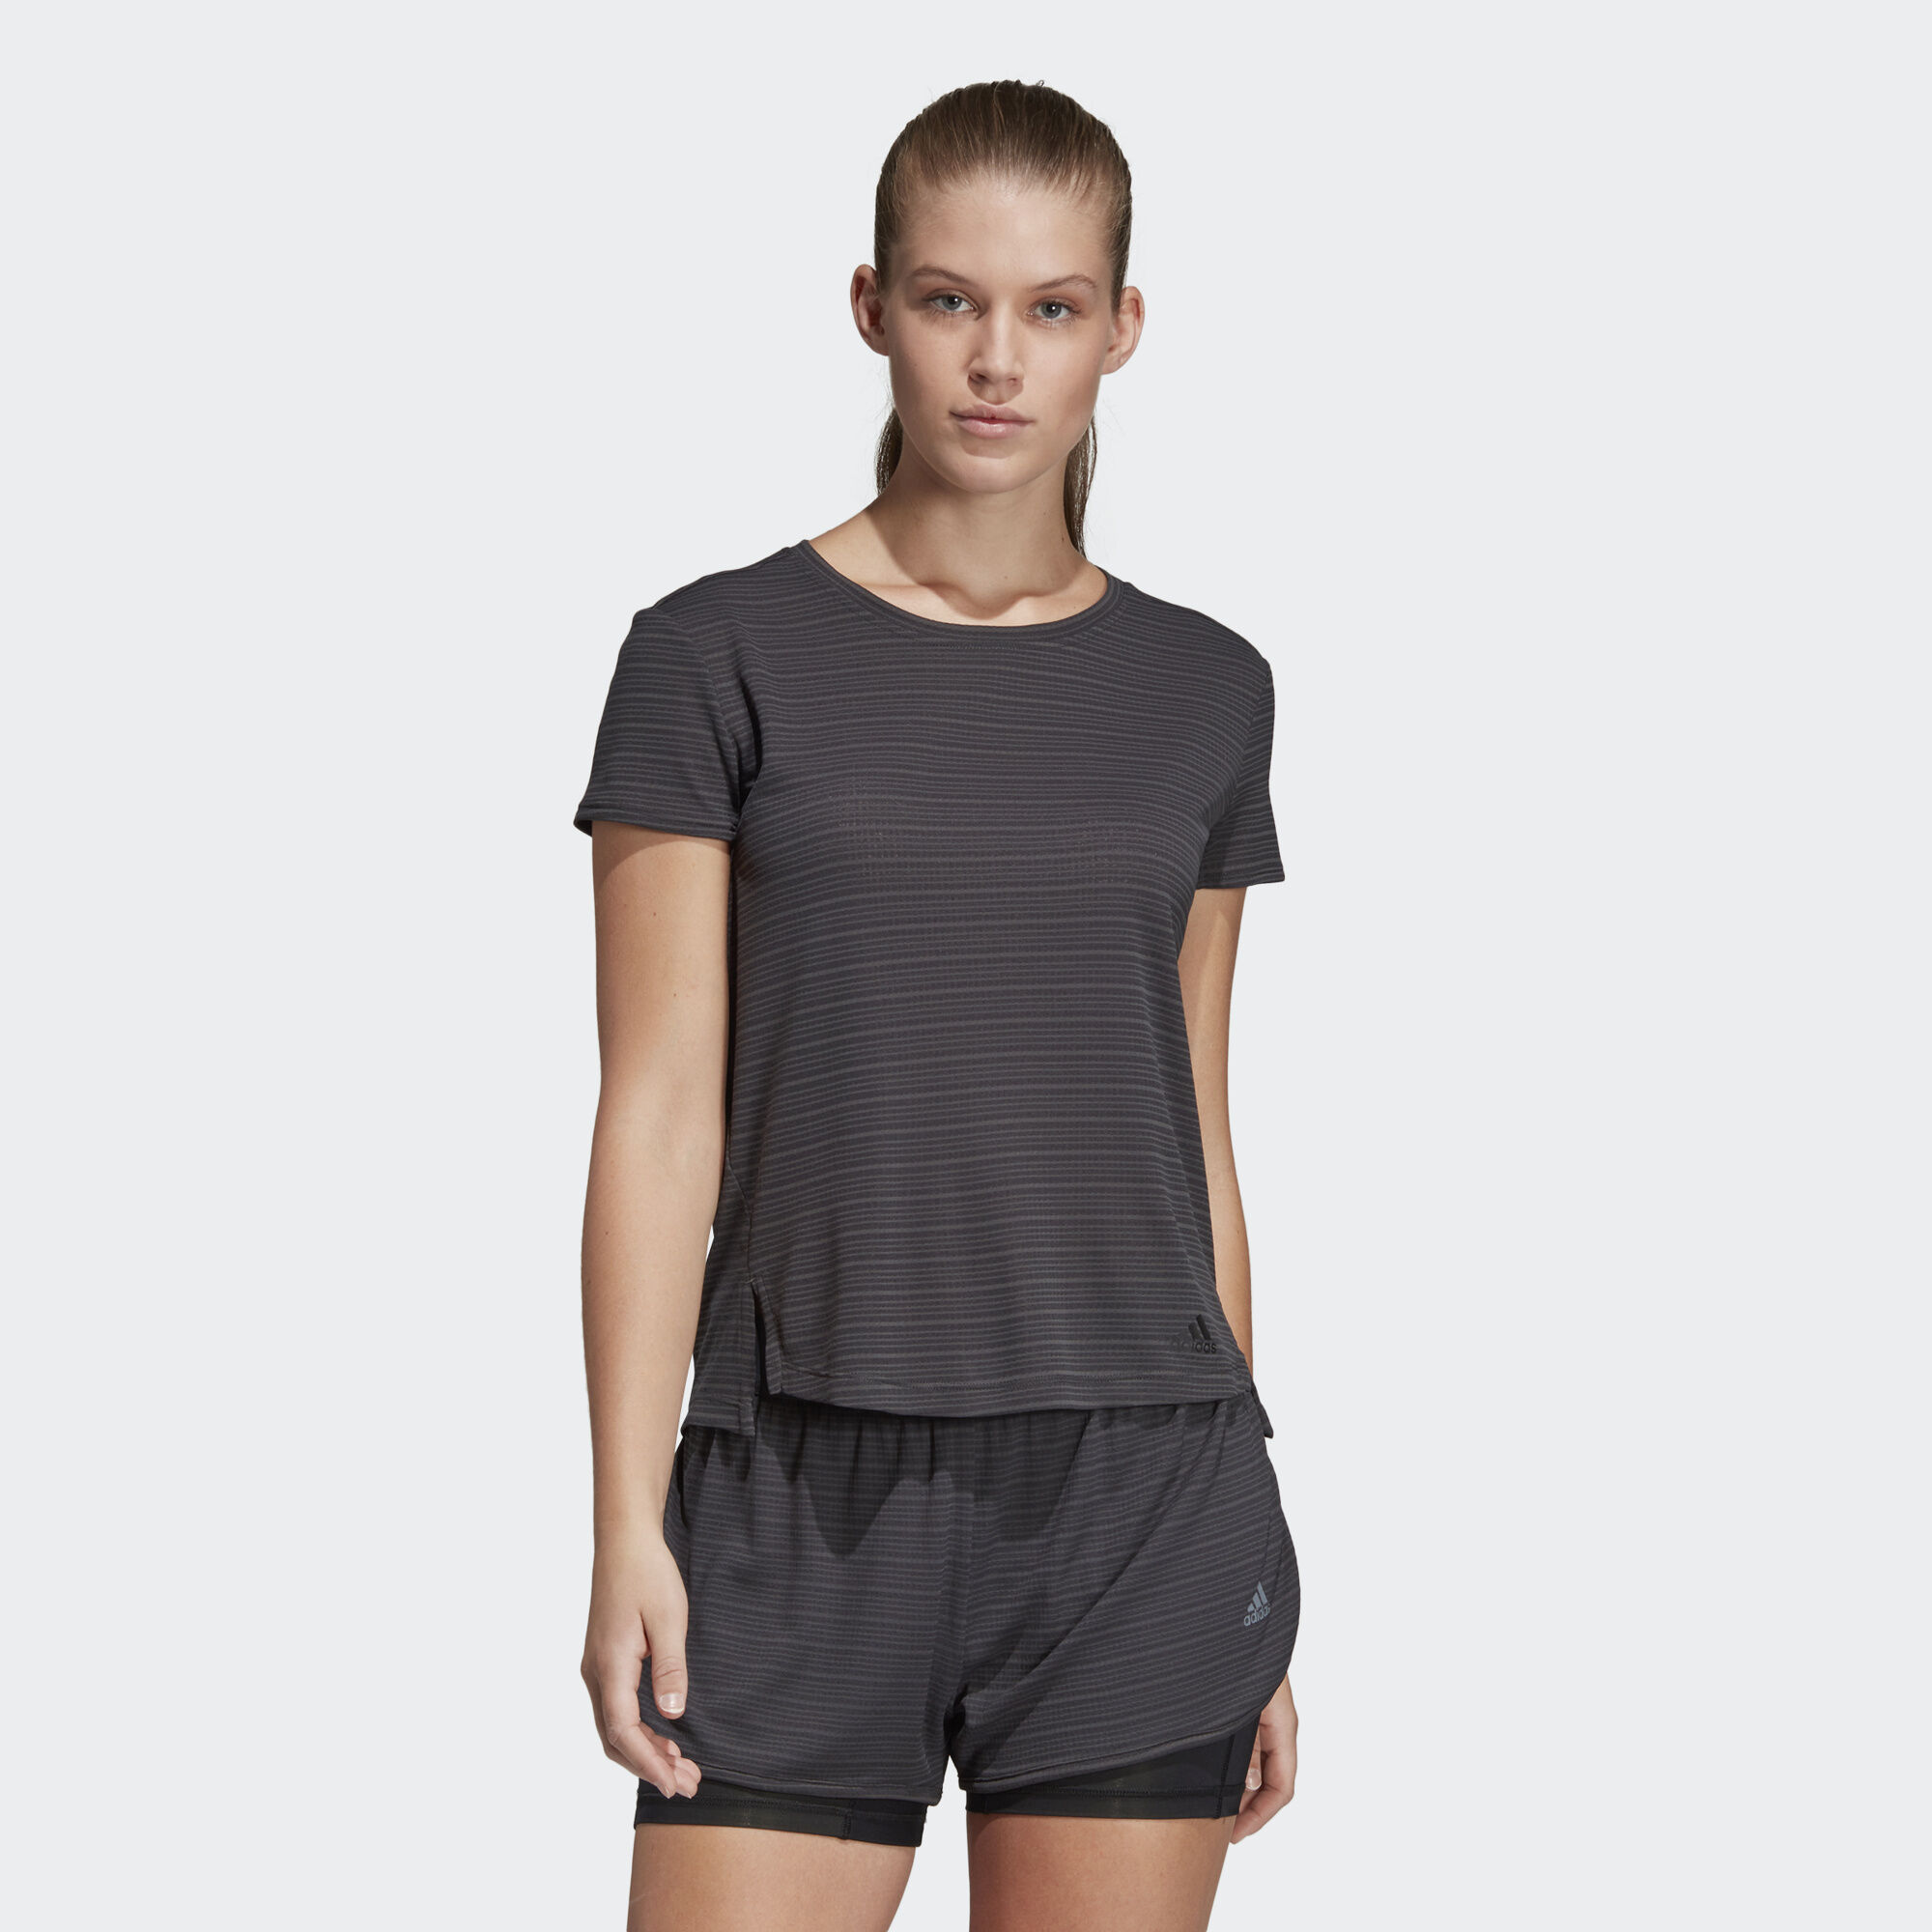 adidas - FreeLift Chill Tee Carbon CV3770. Women Training